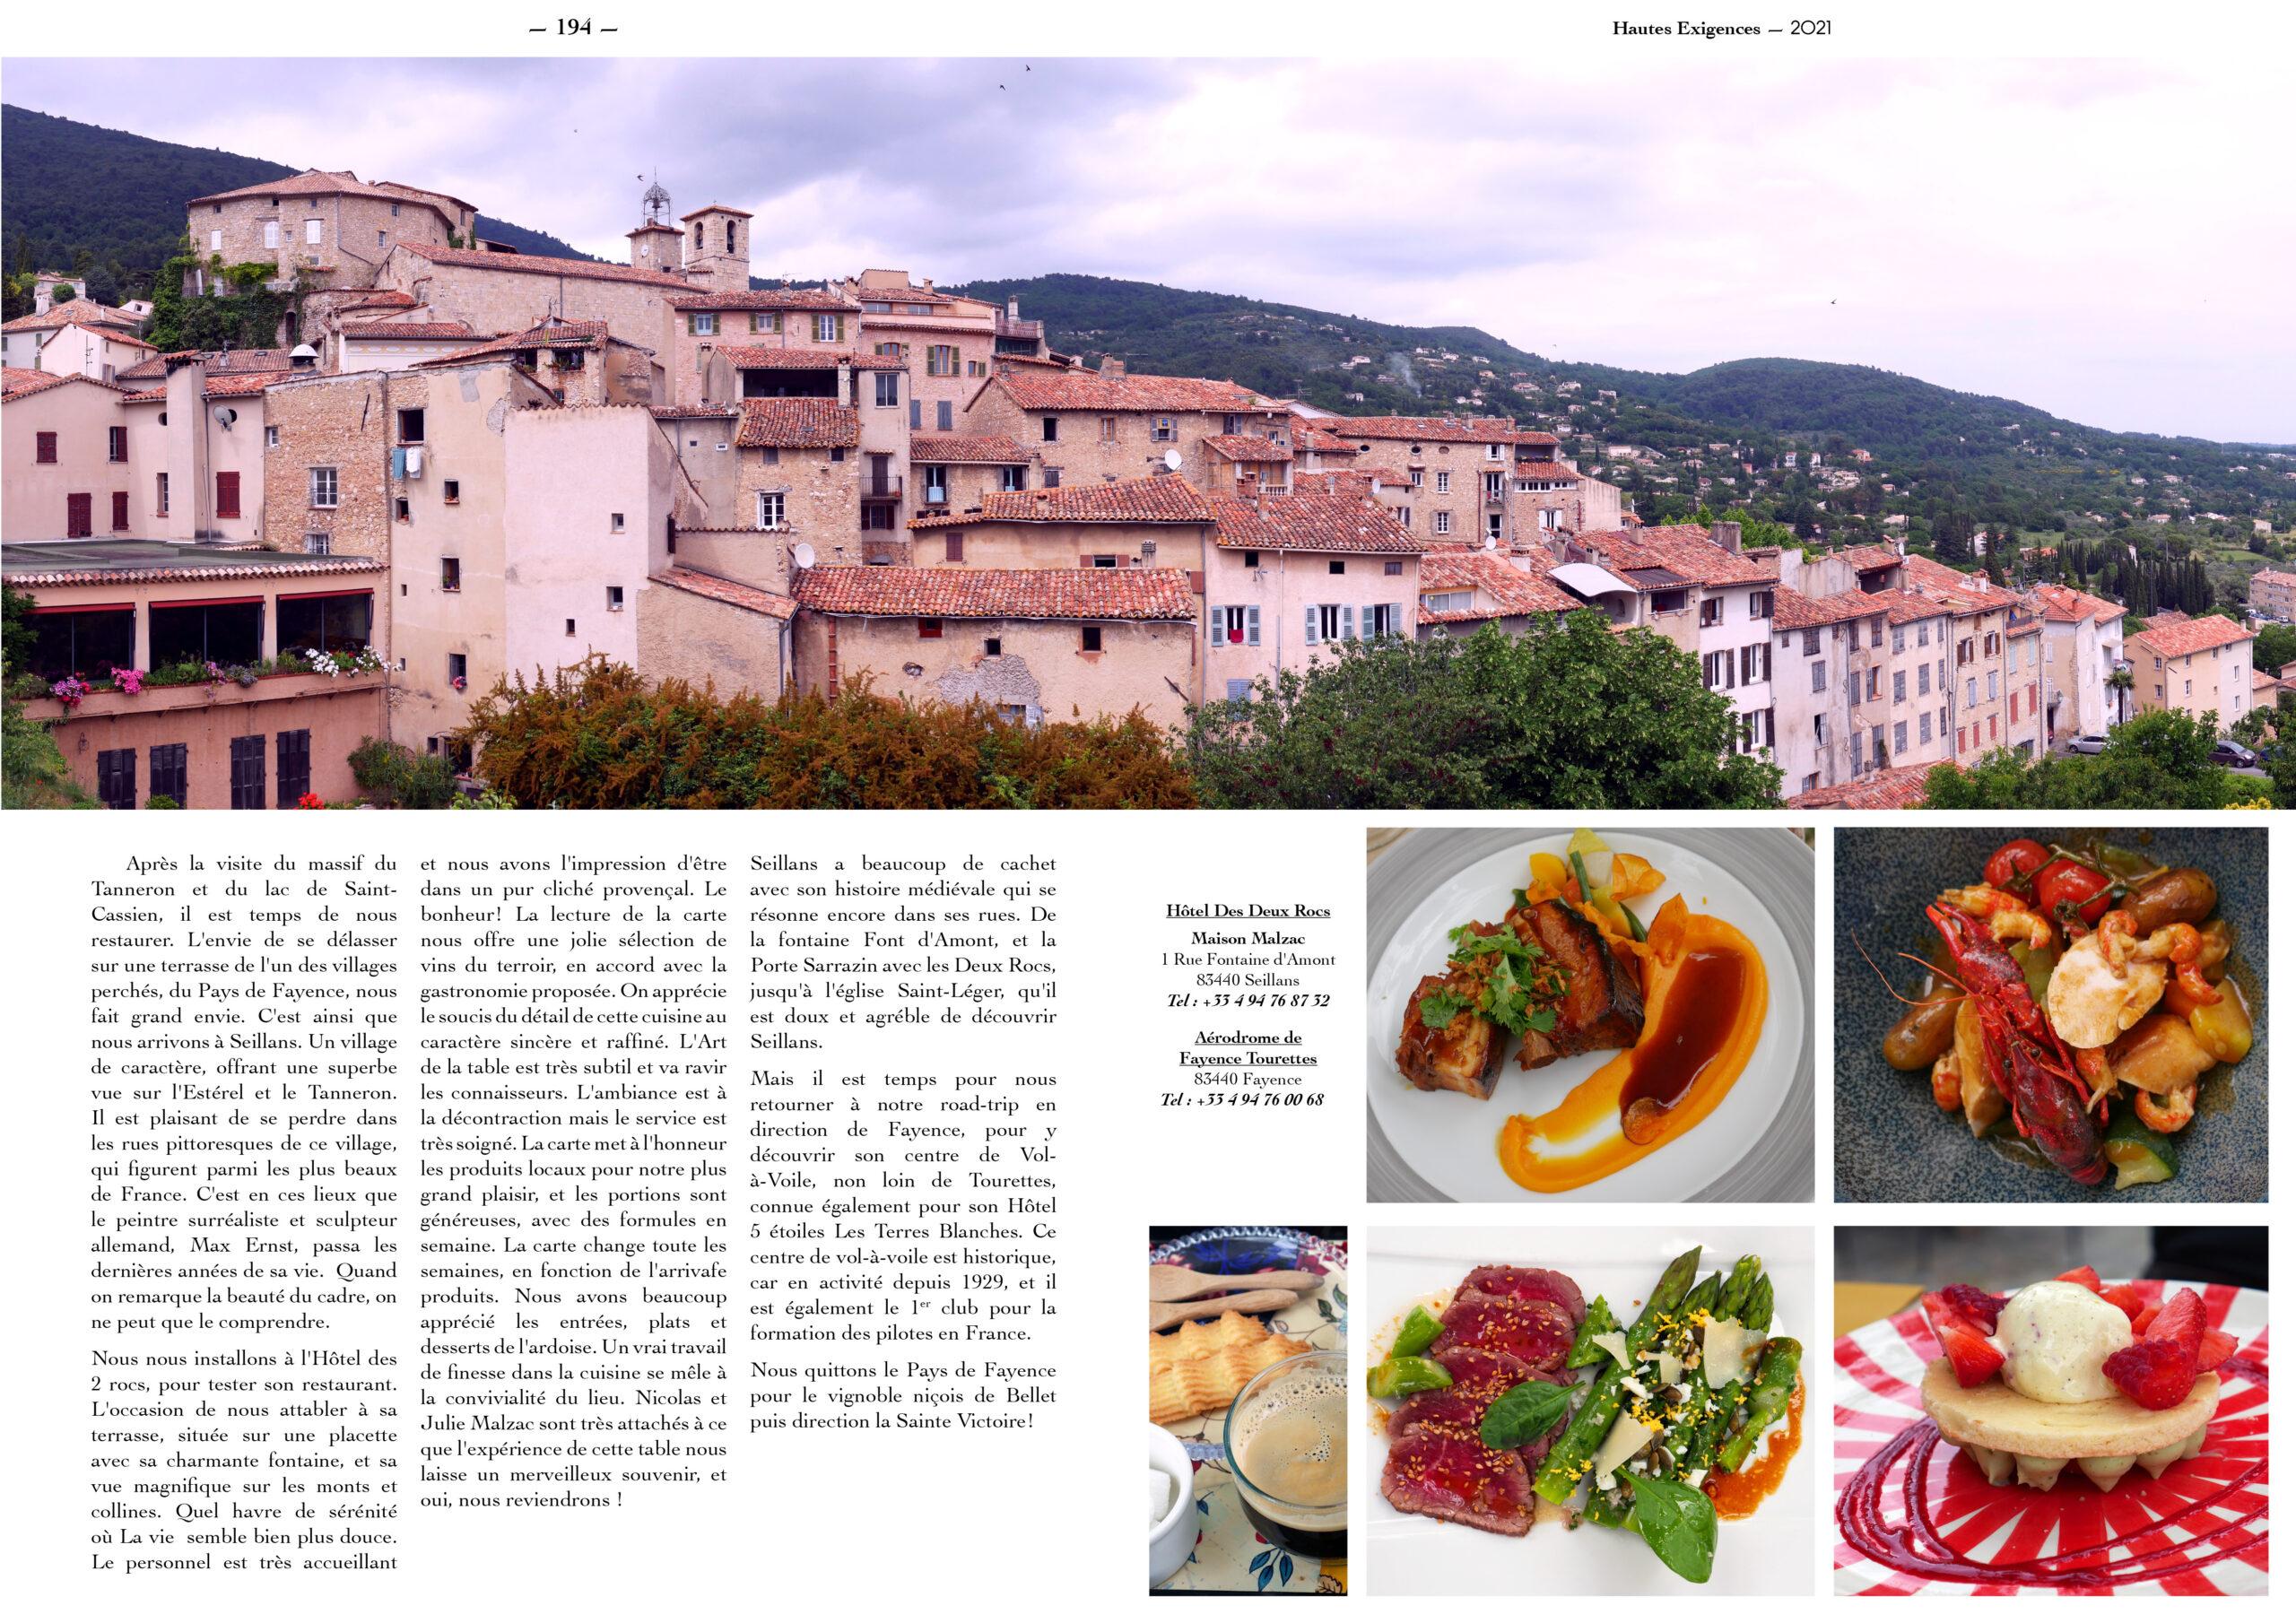 Hautes Exigences Magazine Hors Serie 2021 page 192-193